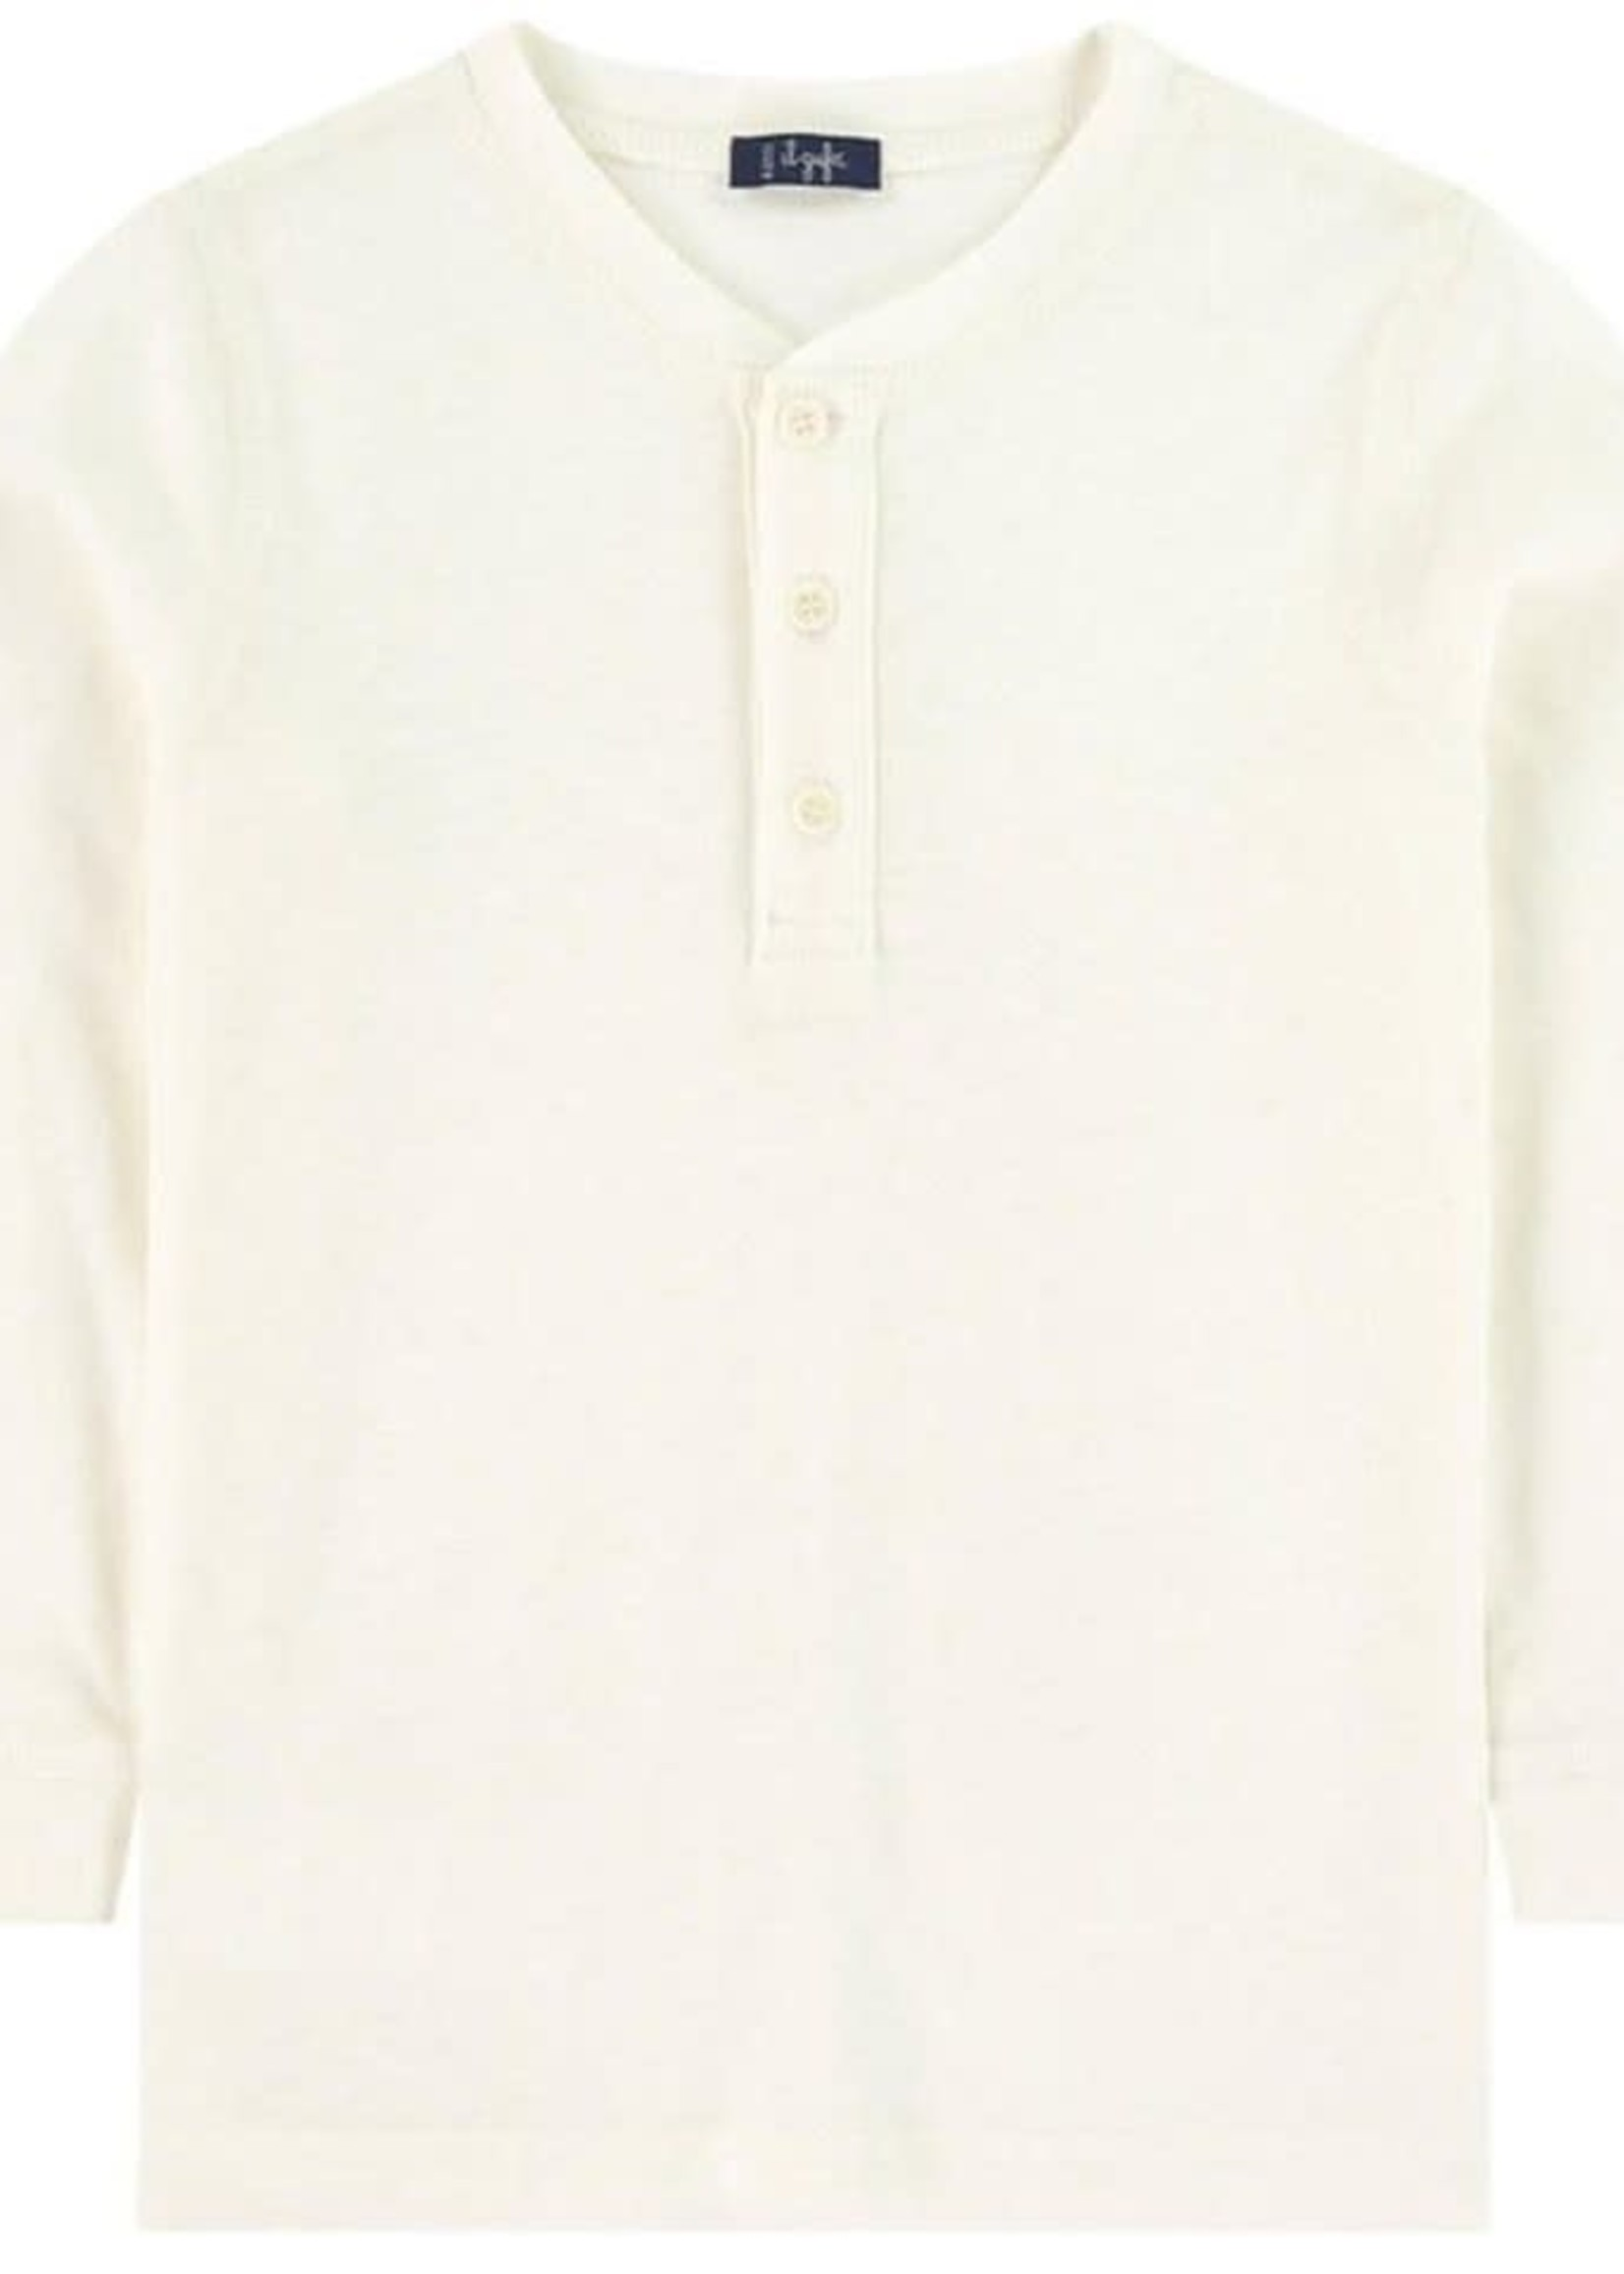 Il Gufo Il Gufo-ss21 white T shirt M/LUNGA